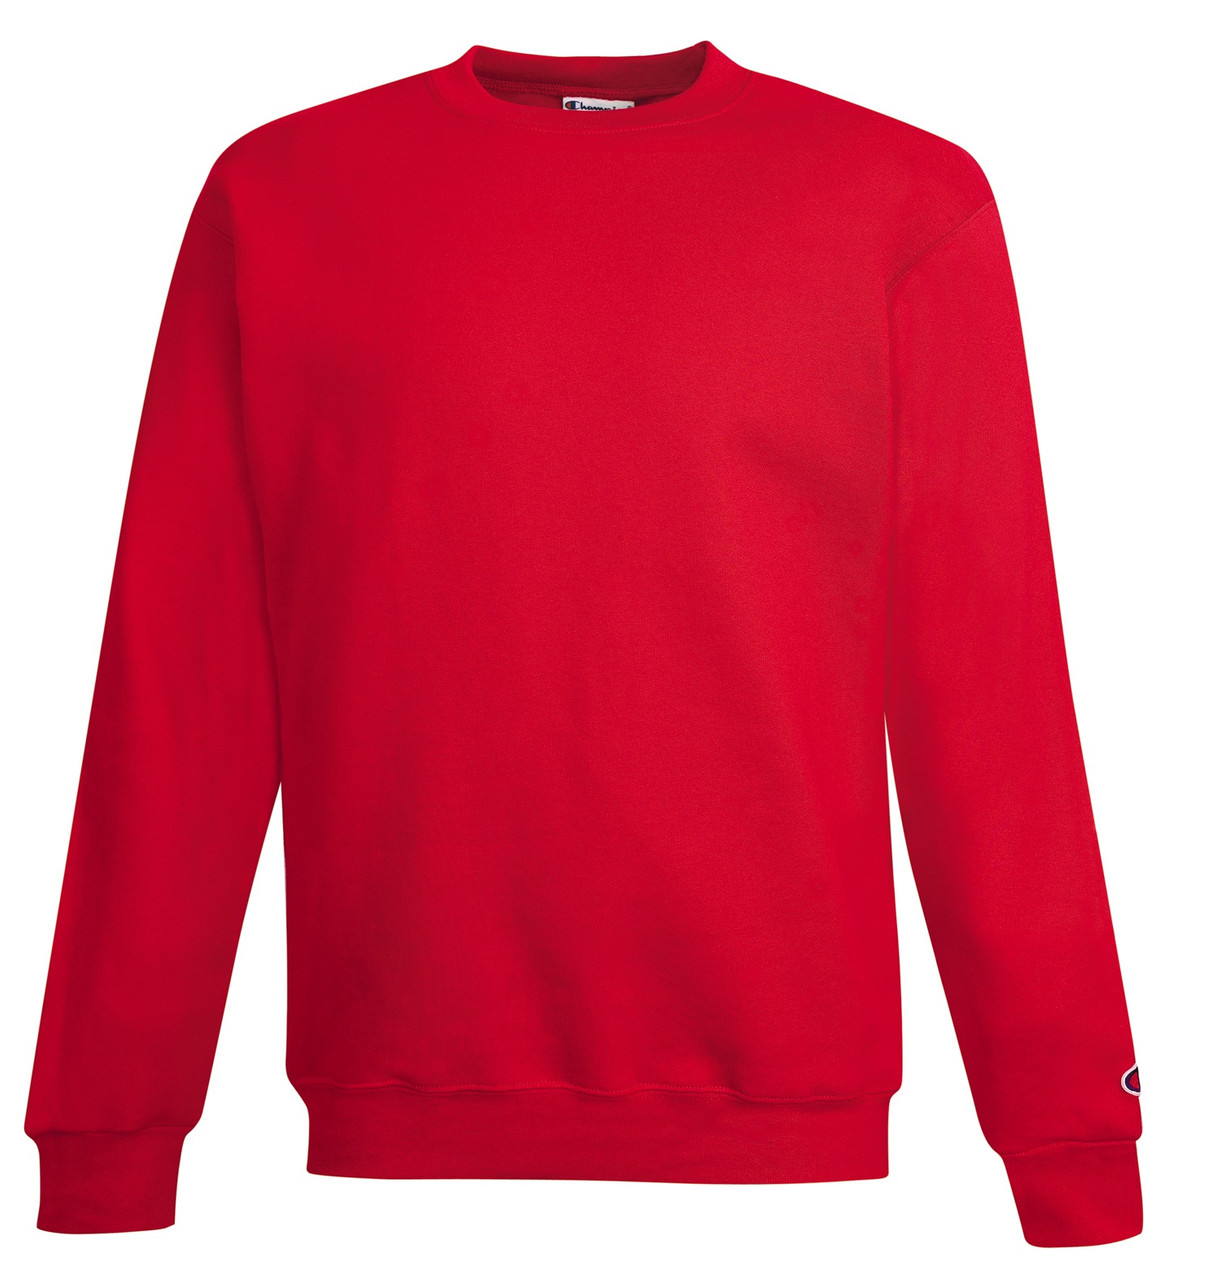 52304fd26b68 Dark Green Front Champion S690 Youth Powerblend Eco Fleece Crew Sweater